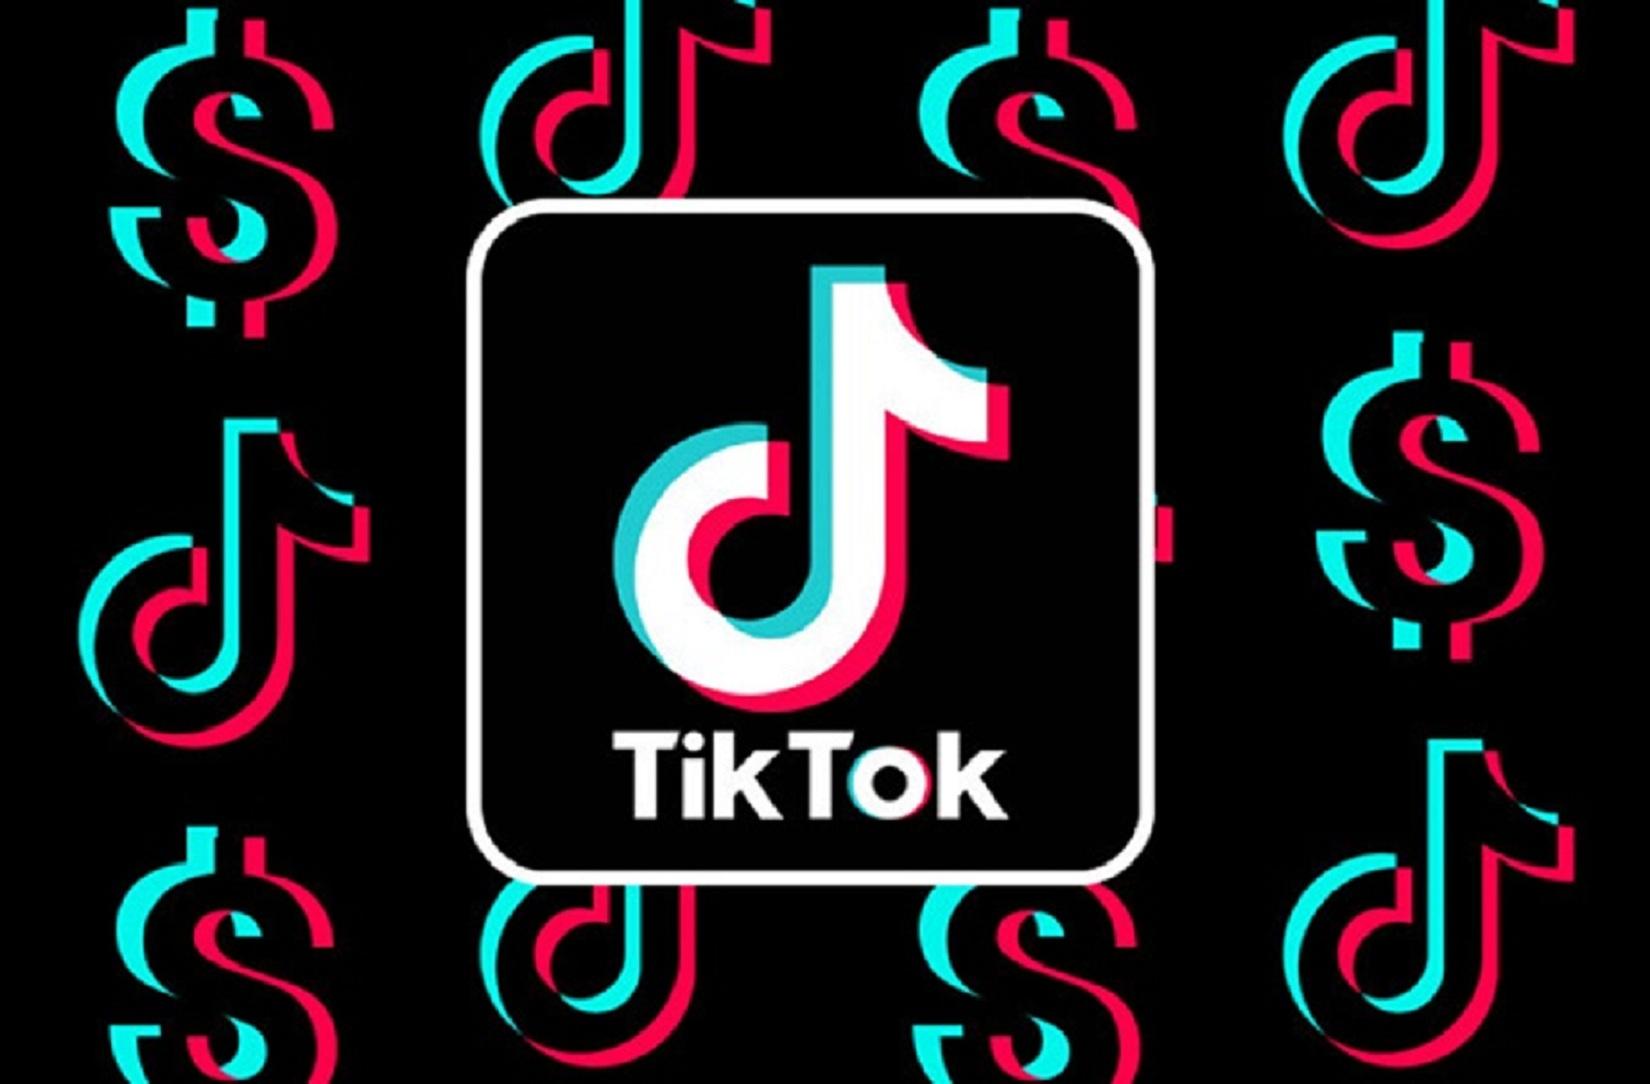 TikTok заработал больше, чем YouTube иNetflix